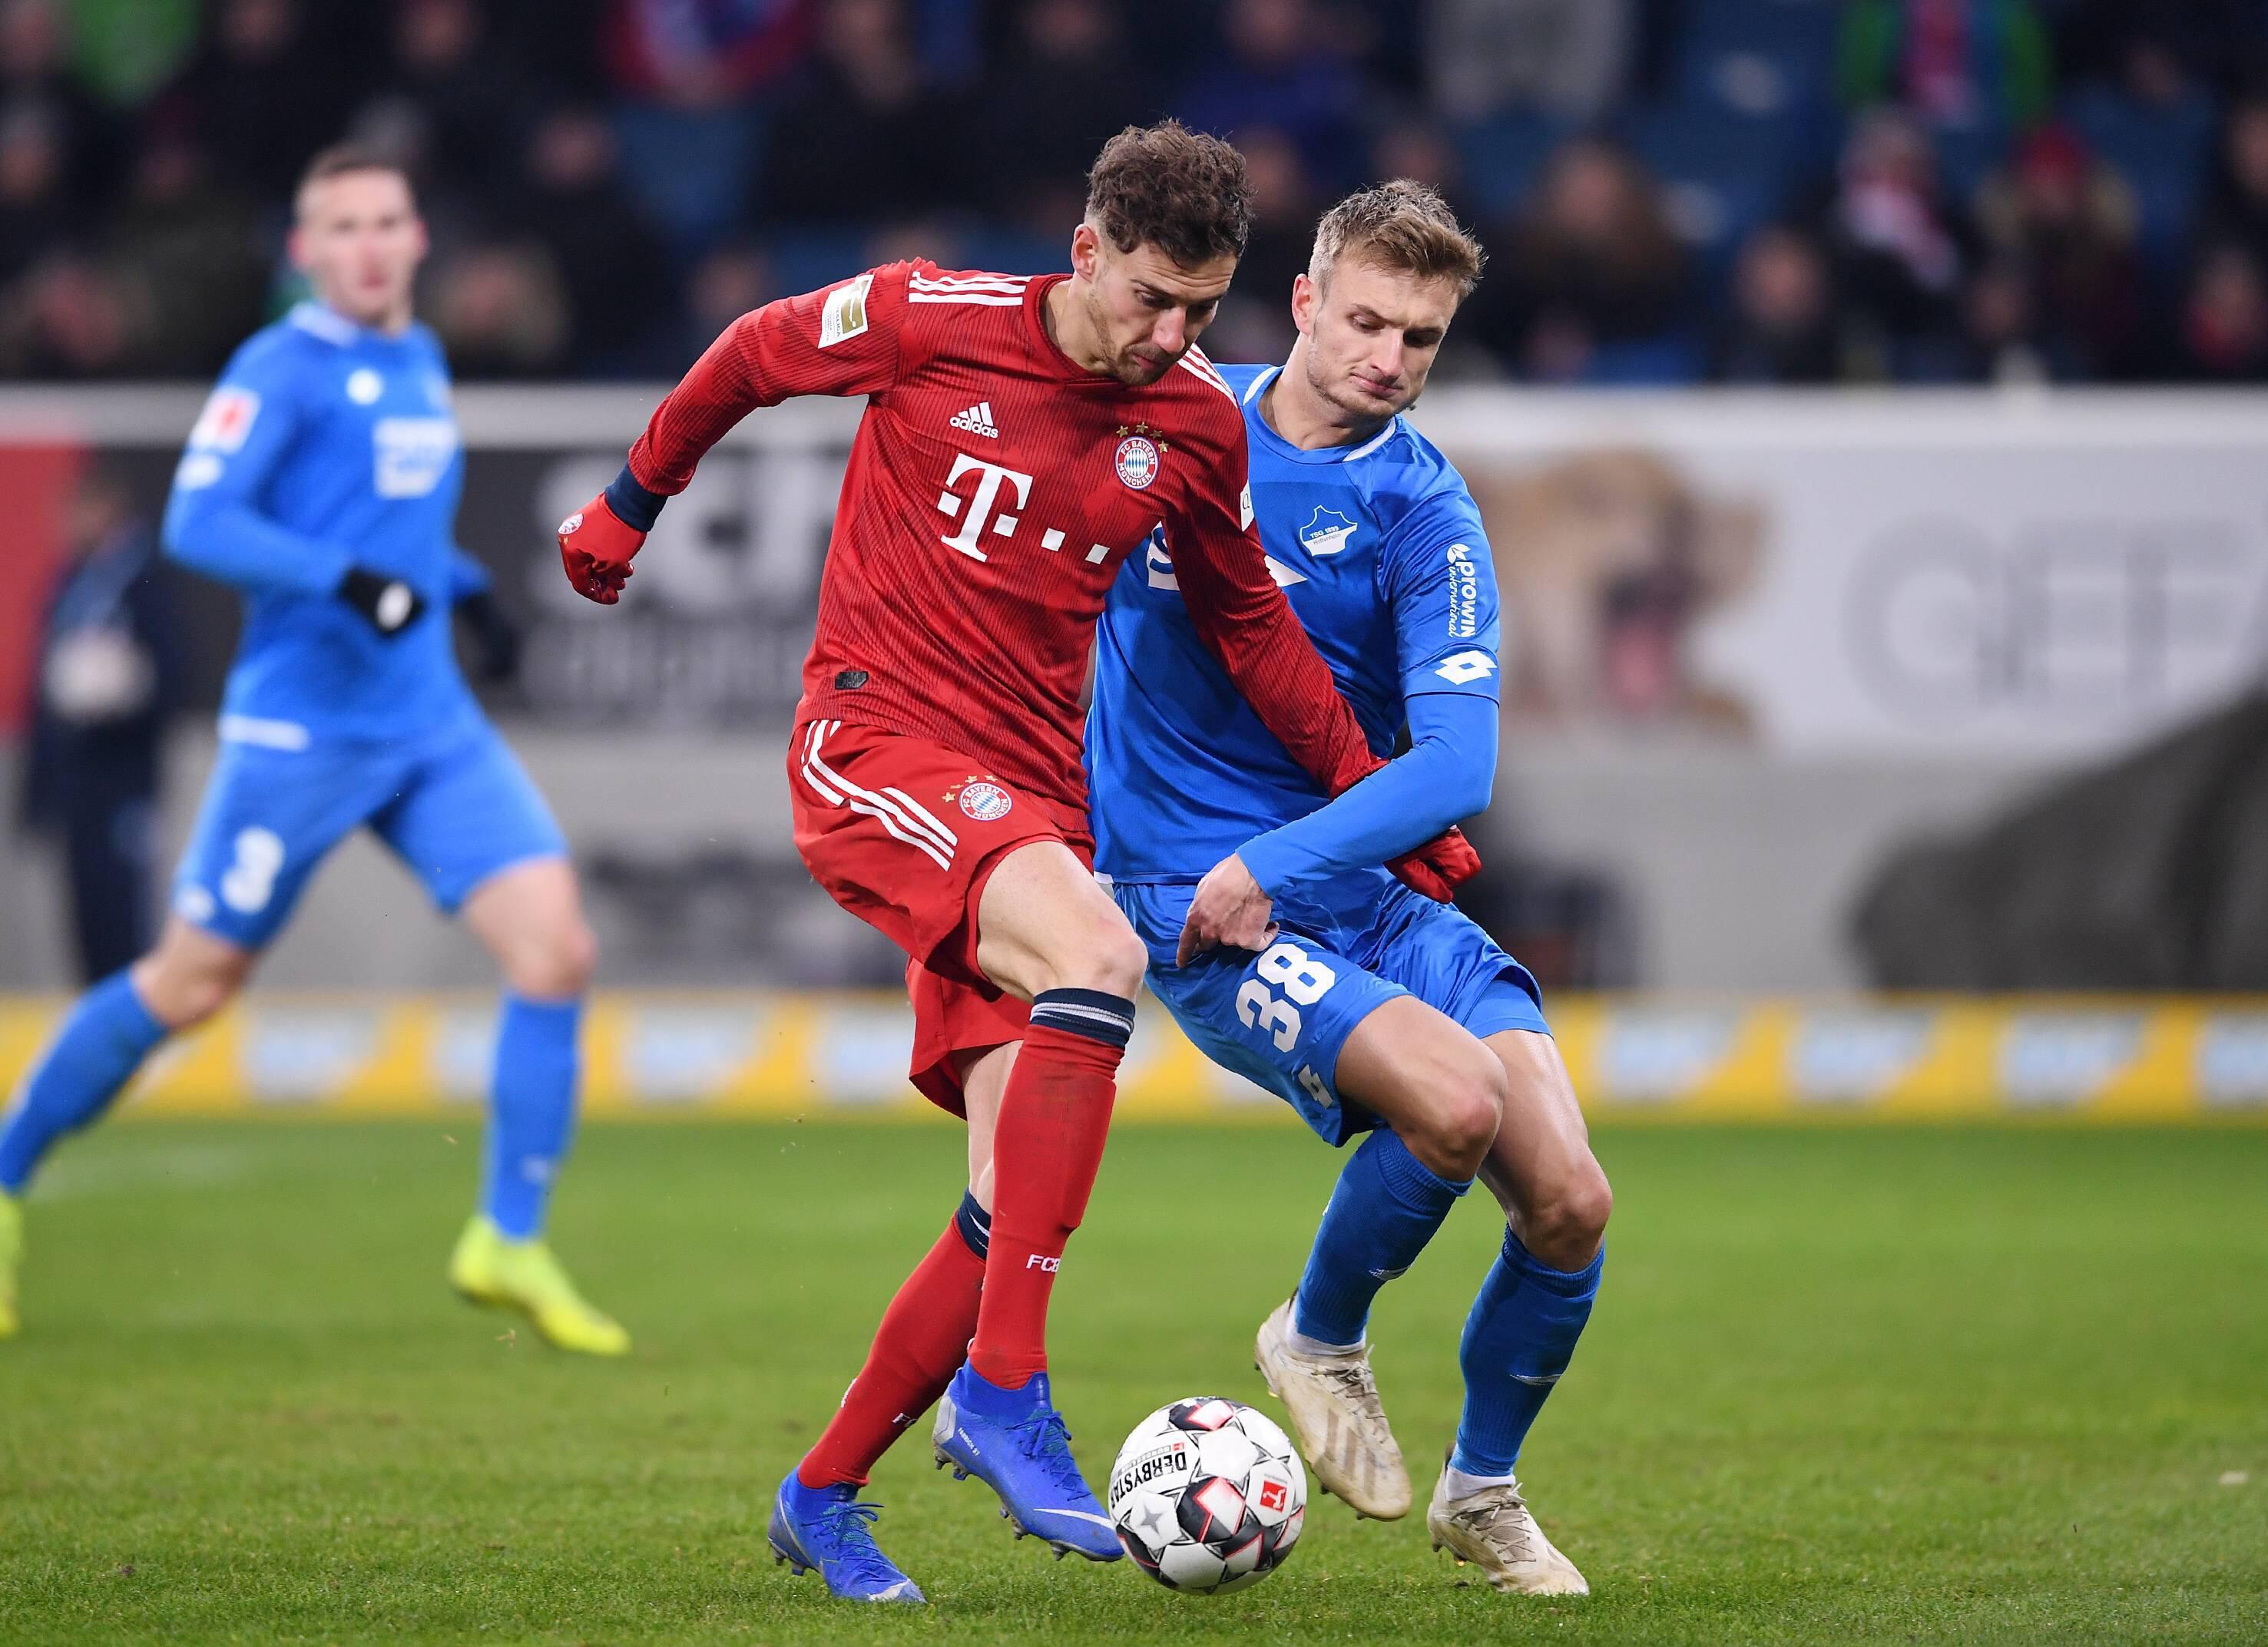 Bild zu Fussball, Bundesliga, Hoffenheim, Bayern, Goretzka